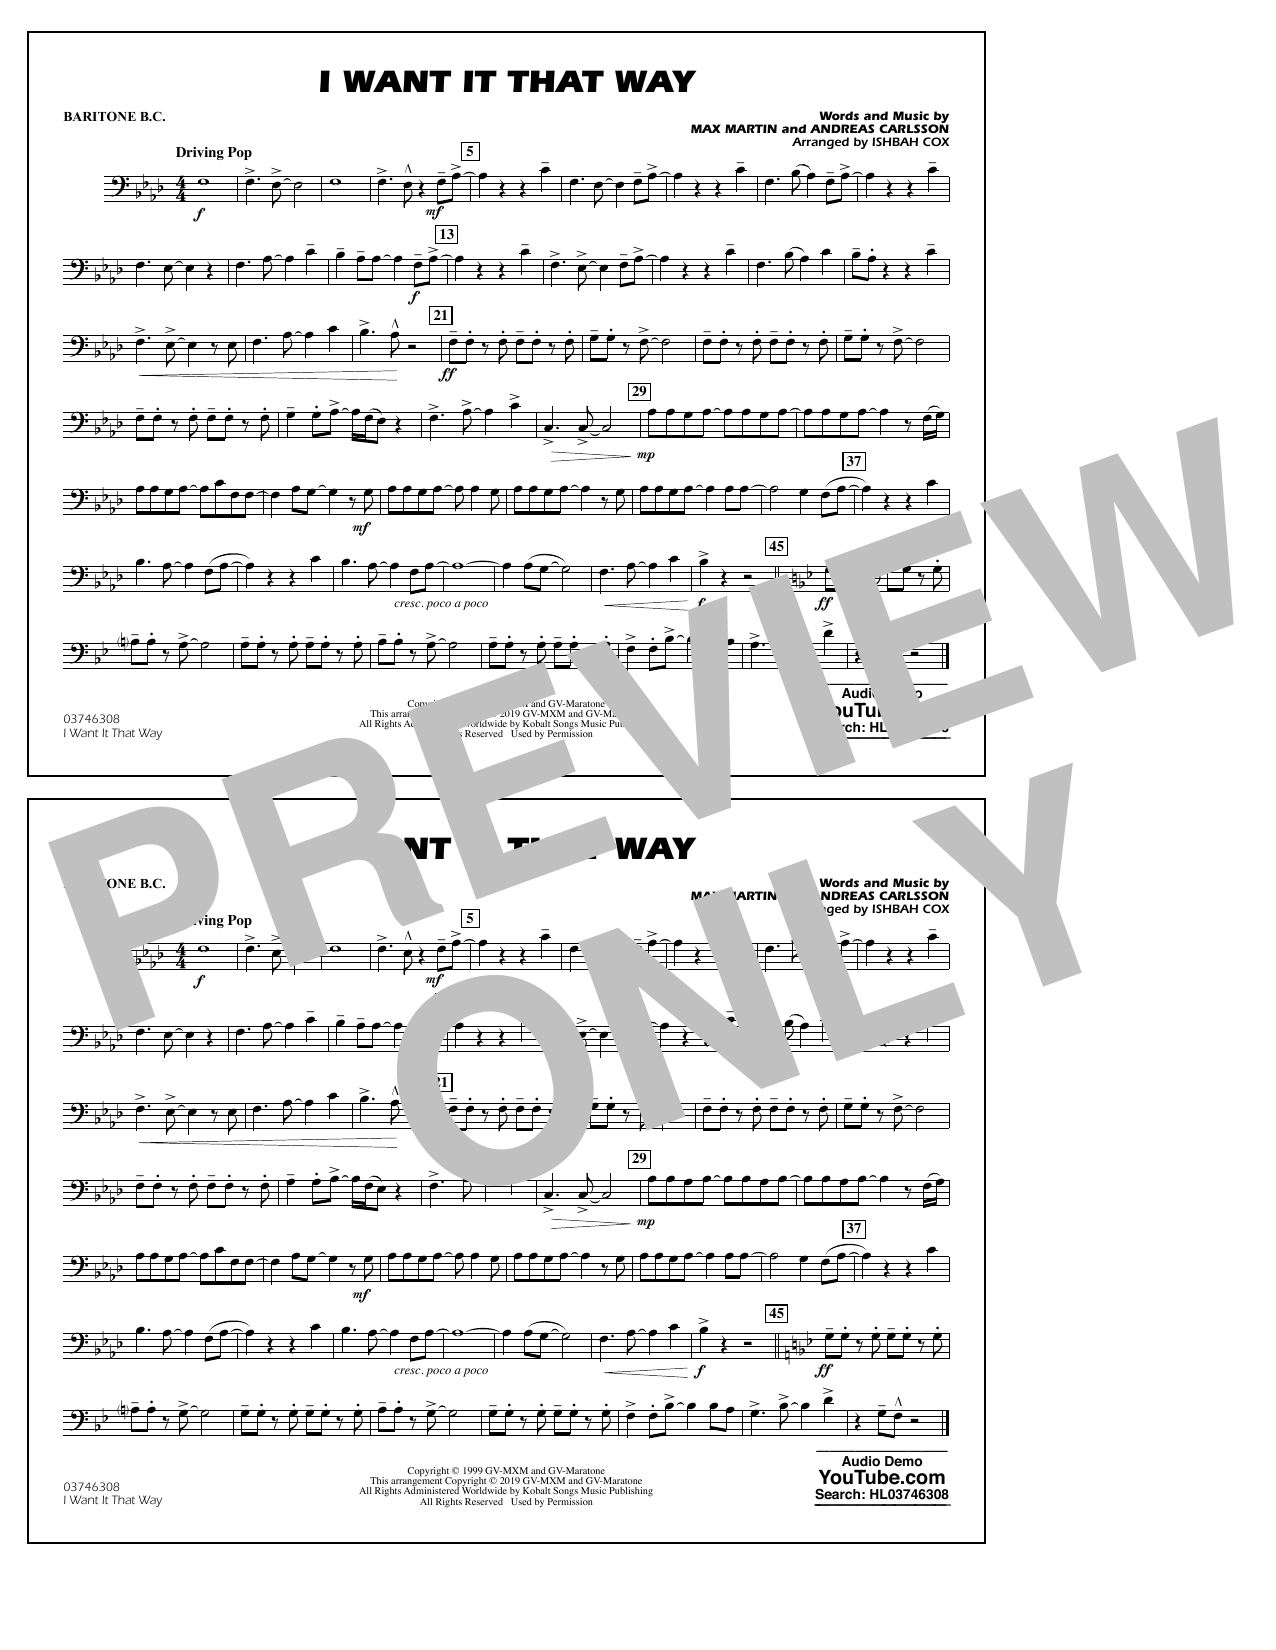 Backstreet Boys I Want It That Way (arr. Ishbah Cox) - Baritone B.C. sheet music notes and chords. Download Printable PDF.